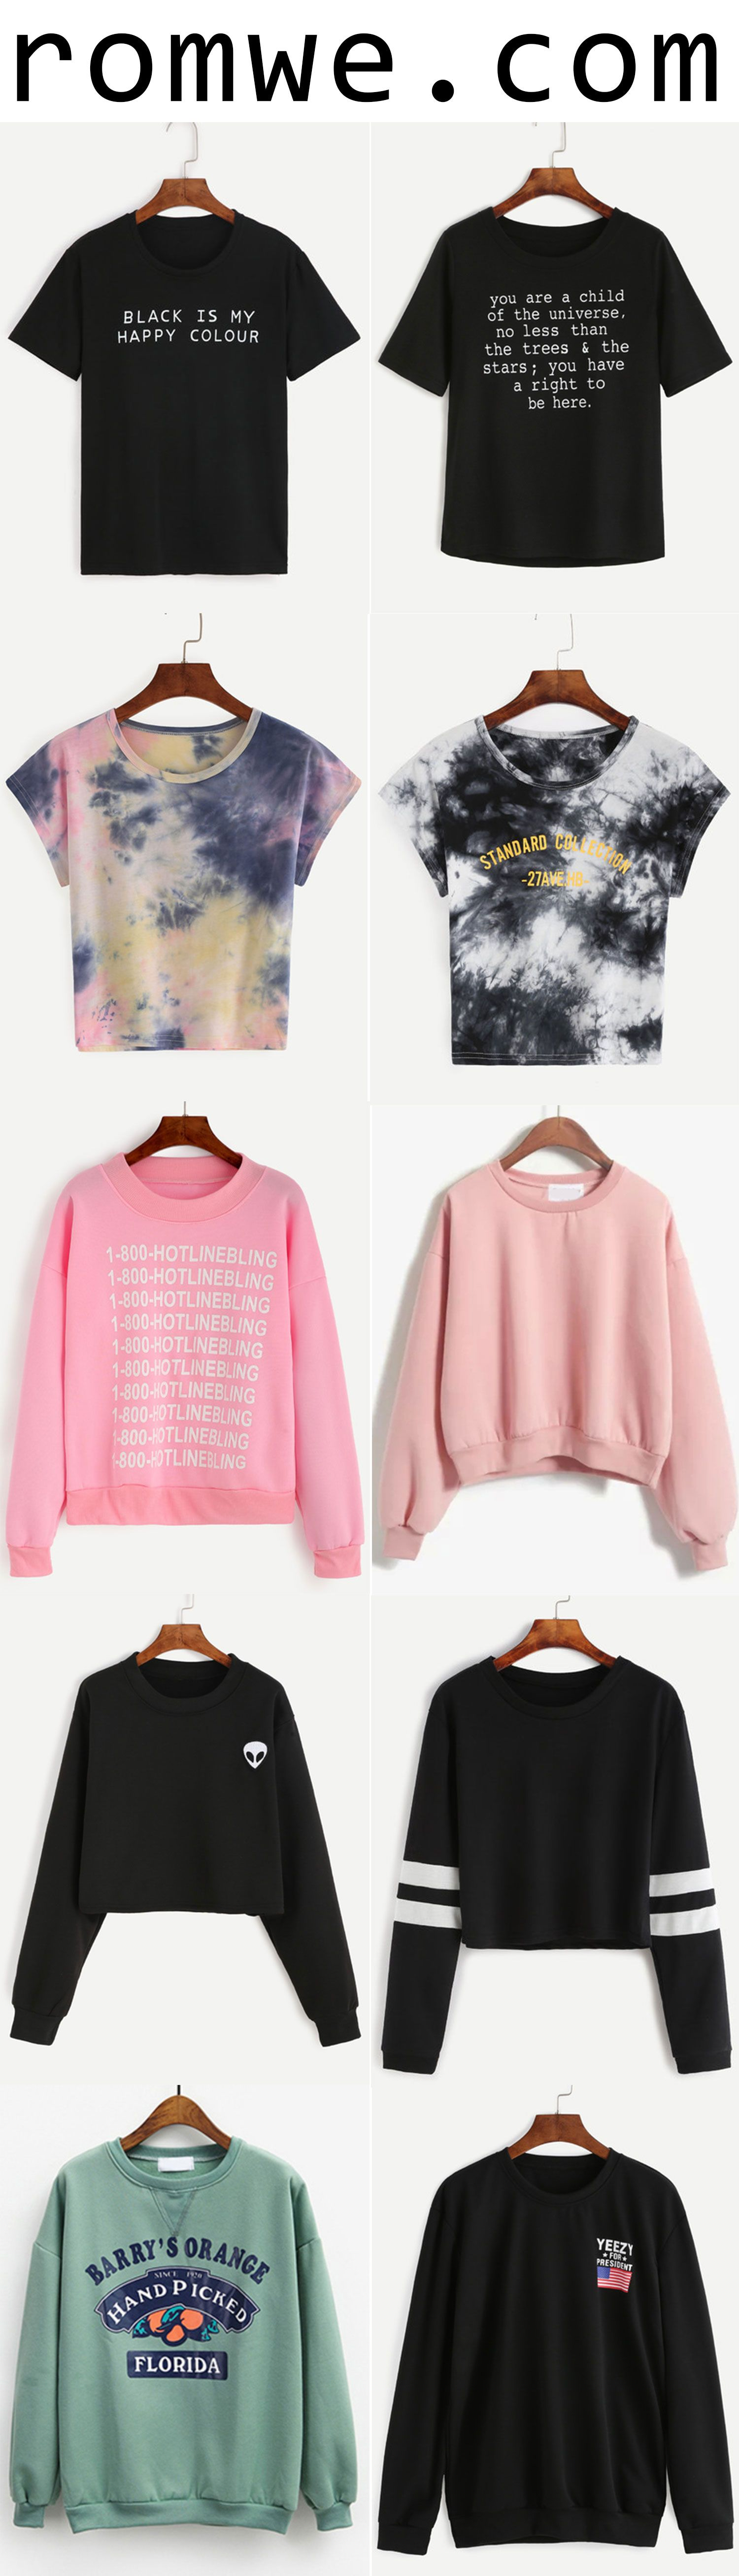 Autumn Chic - fashion t shirts and comfortable sweatshirts from romwe.com